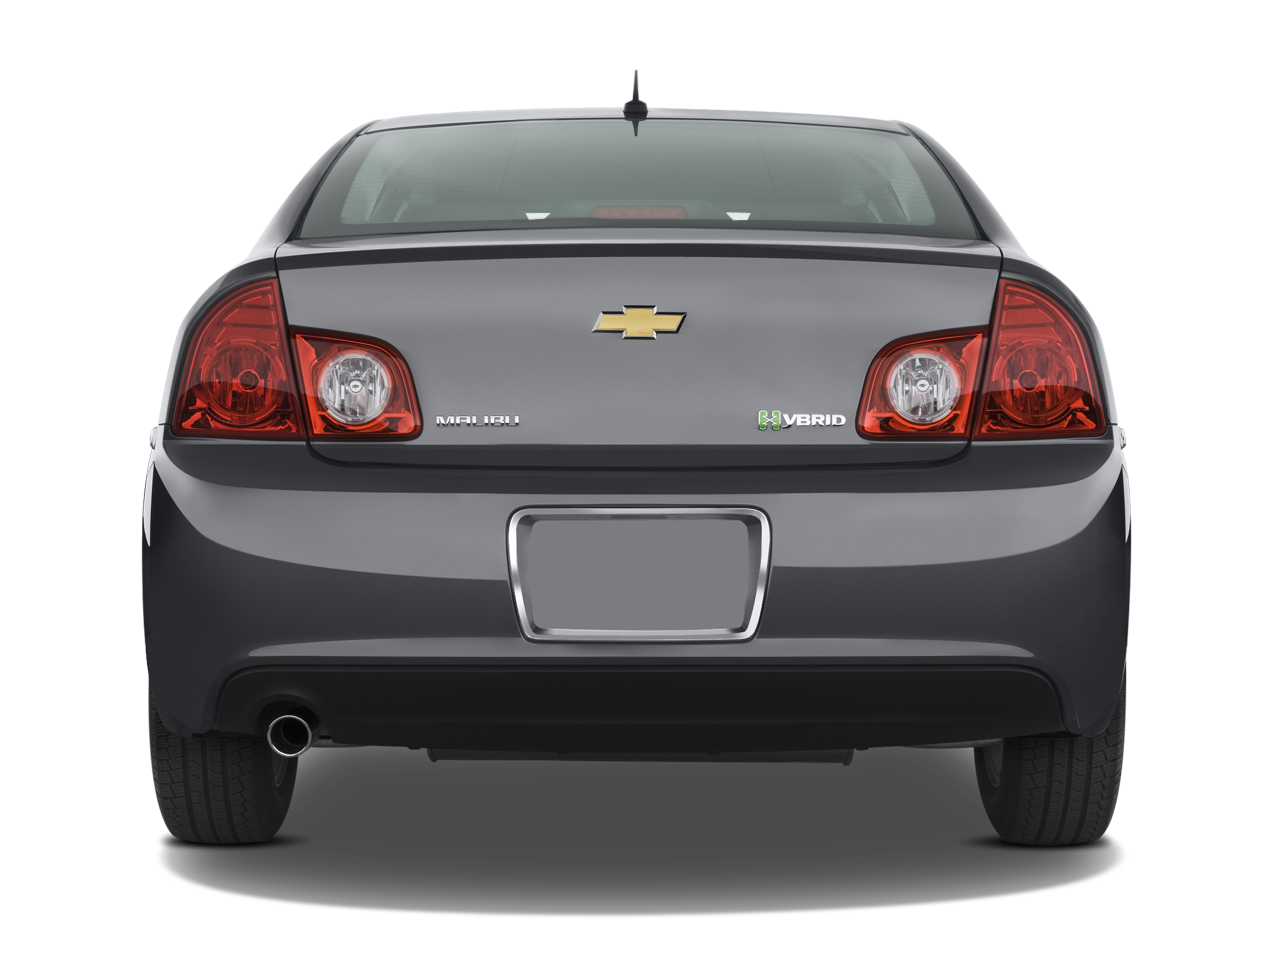 2009 chevy malibu ltz fuel efficient news car features. Black Bedroom Furniture Sets. Home Design Ideas